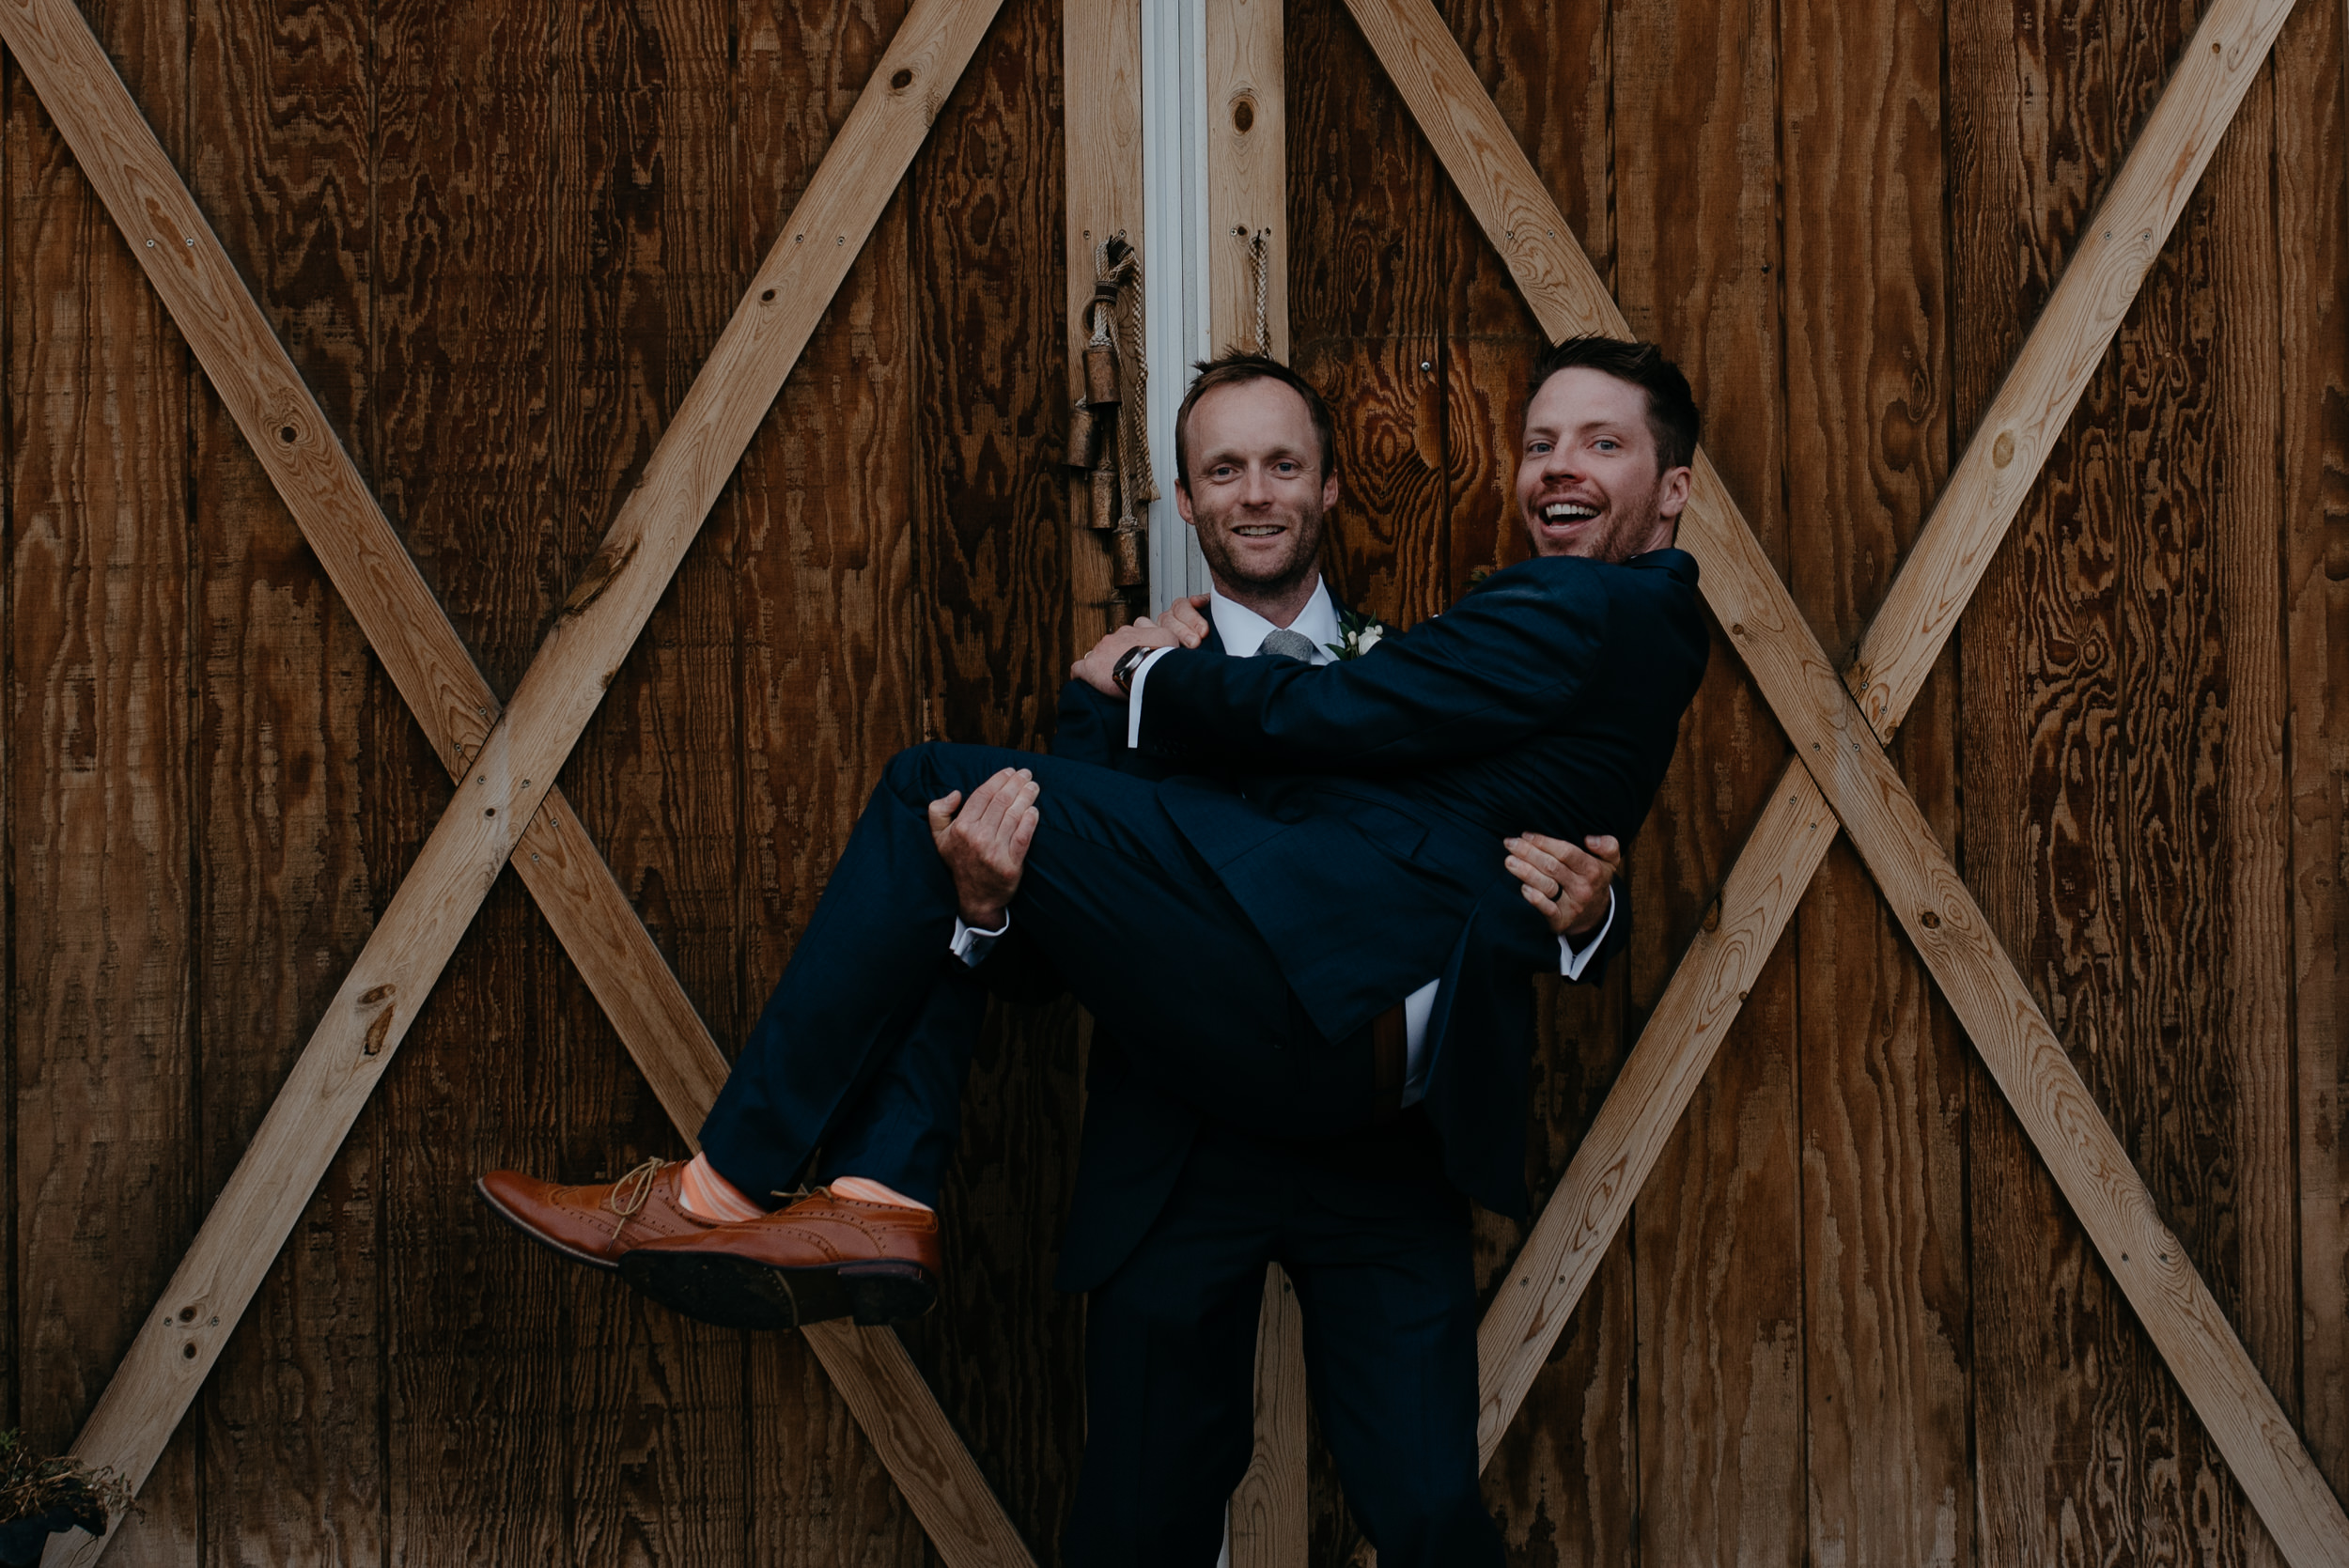 Groom and best man at Boulder, Colorado wedding.